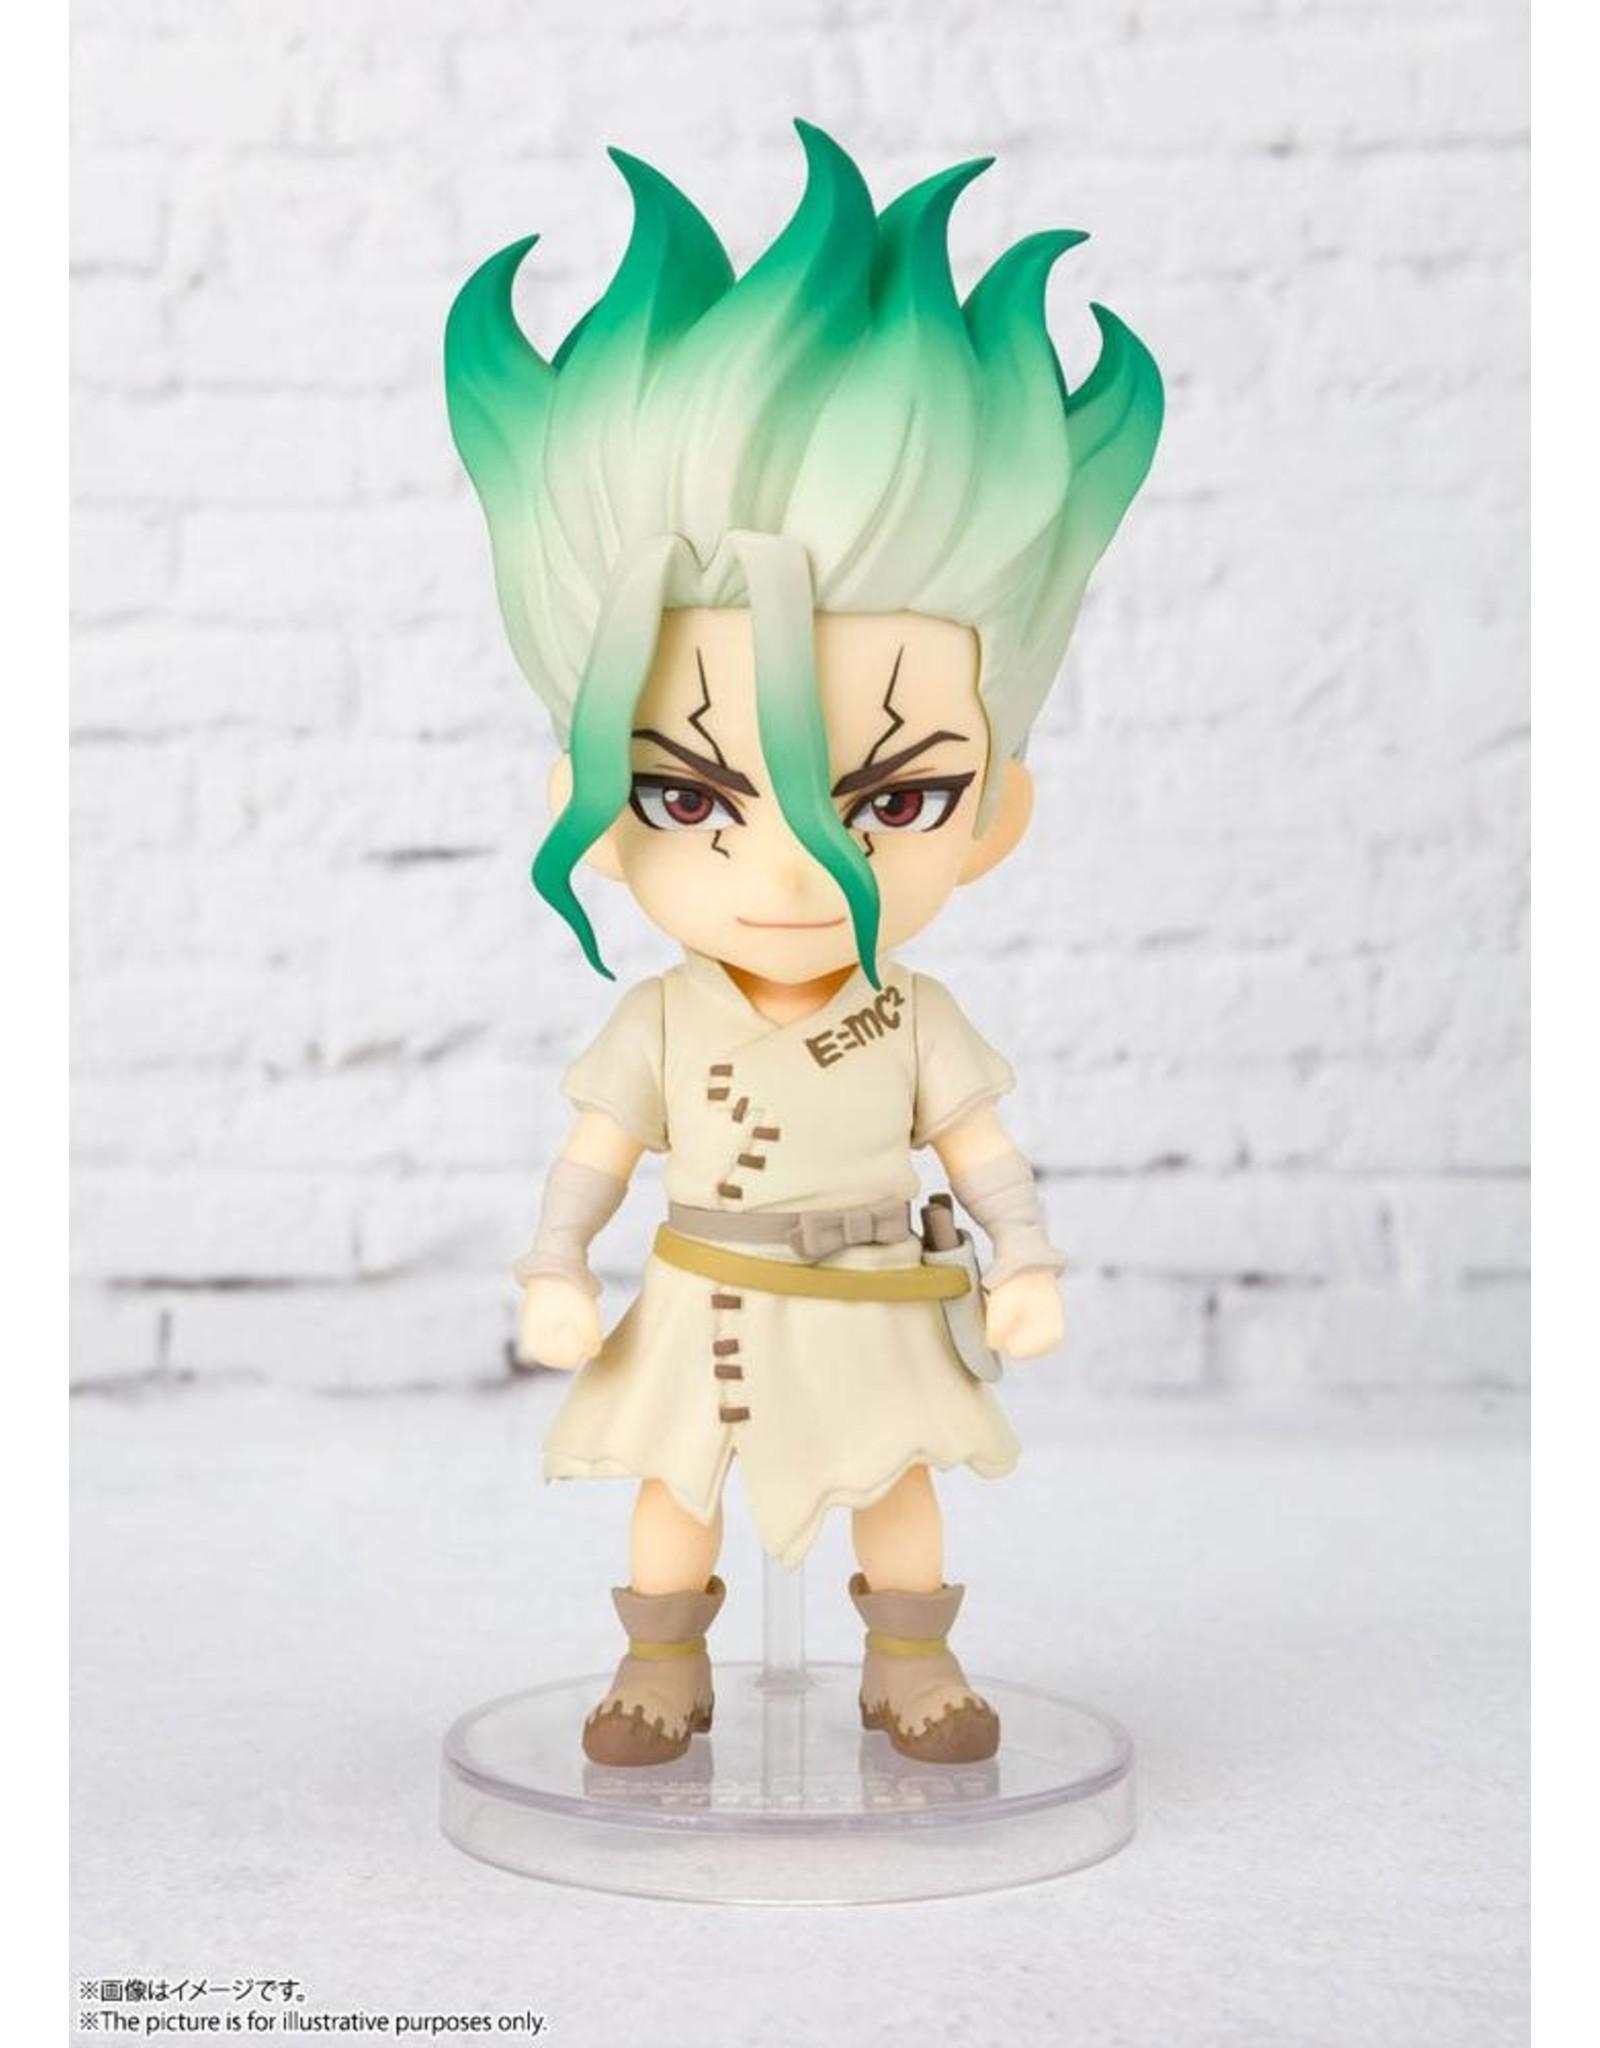 Dr Stone - Ishigami Senku - Mini Figuarts Action FigurE